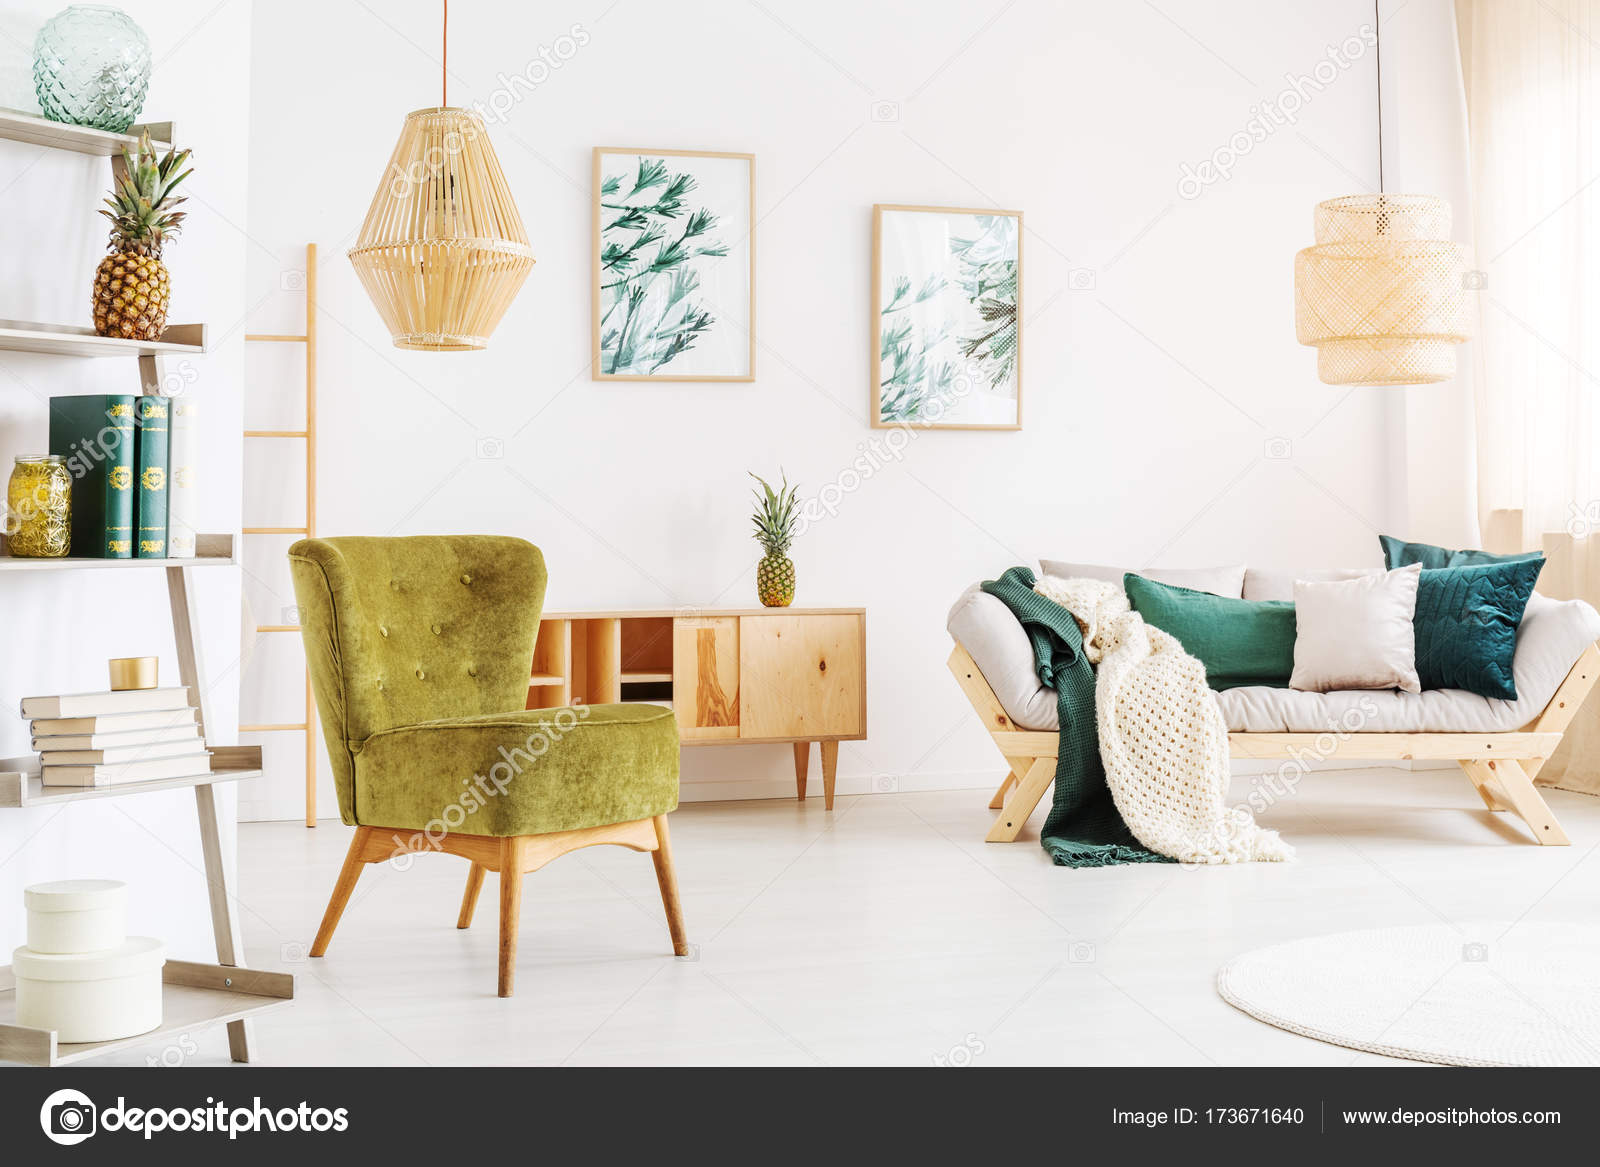 Rotan lampen in de woonkamer — Stockfoto © photographee.eu #173671640